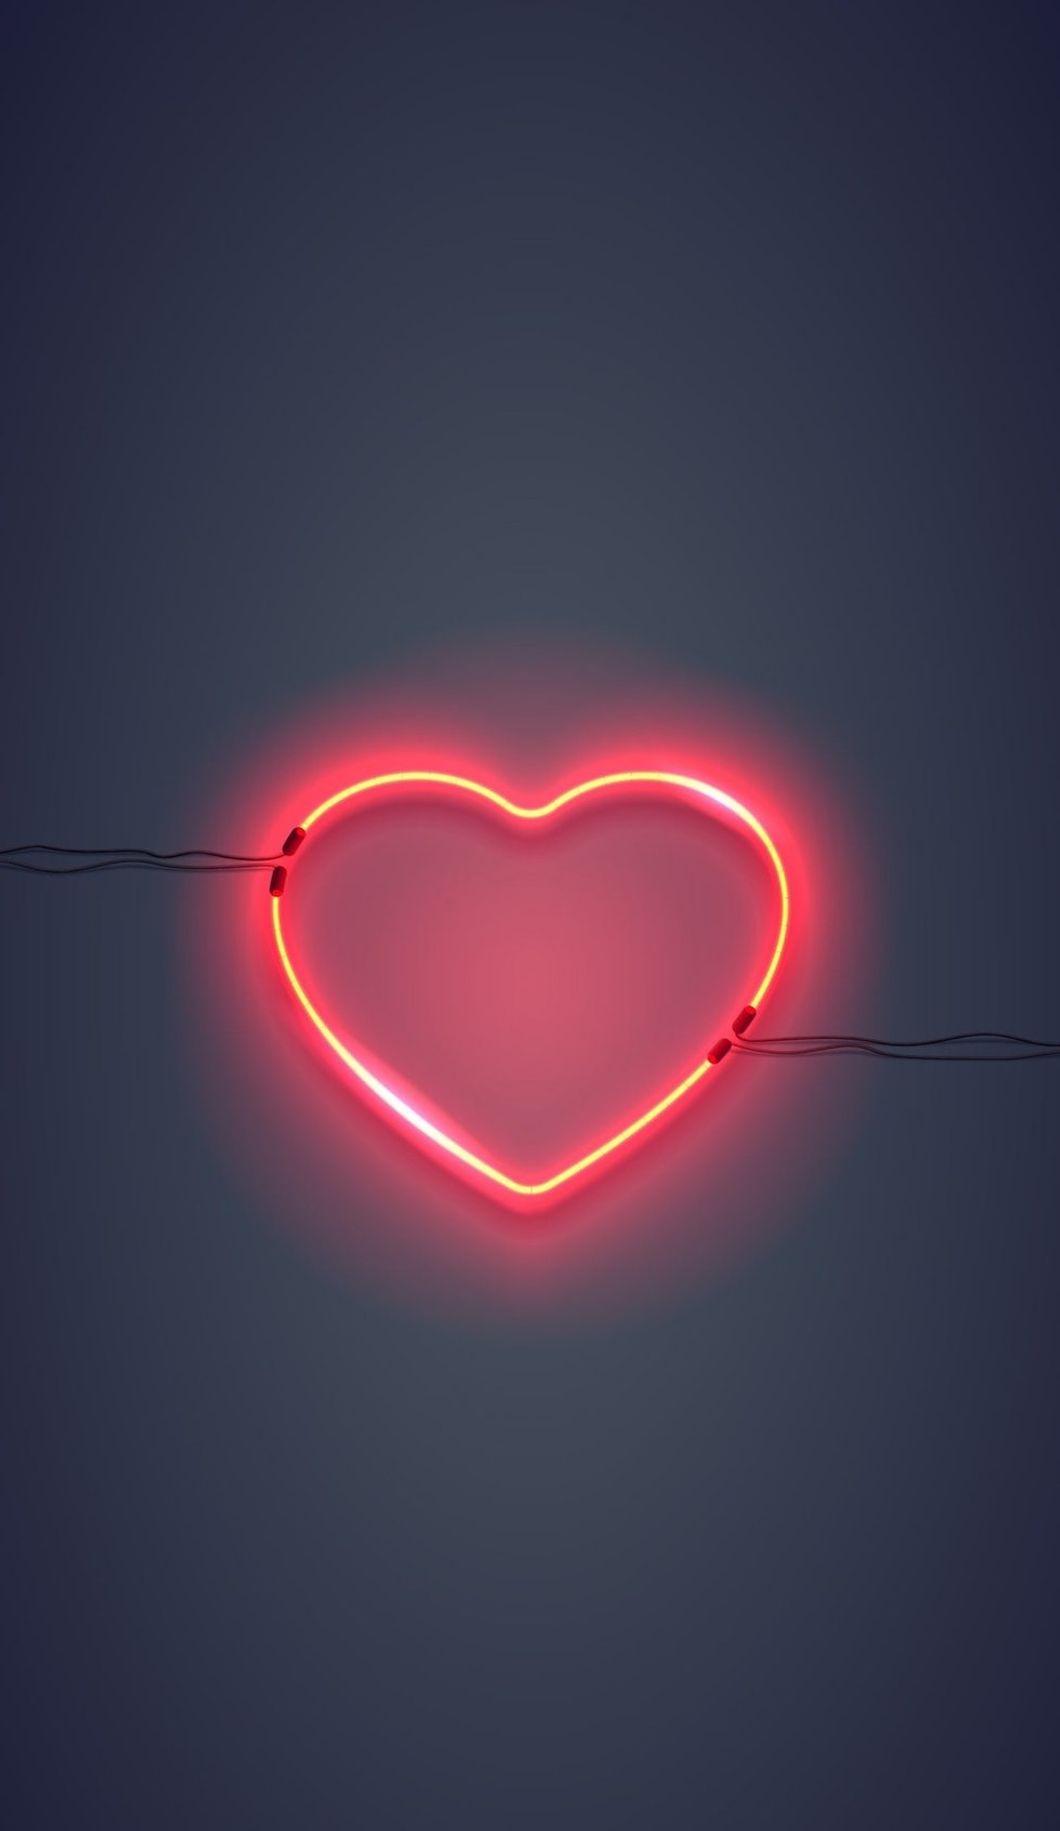 Unsplash- heart made from neon lights